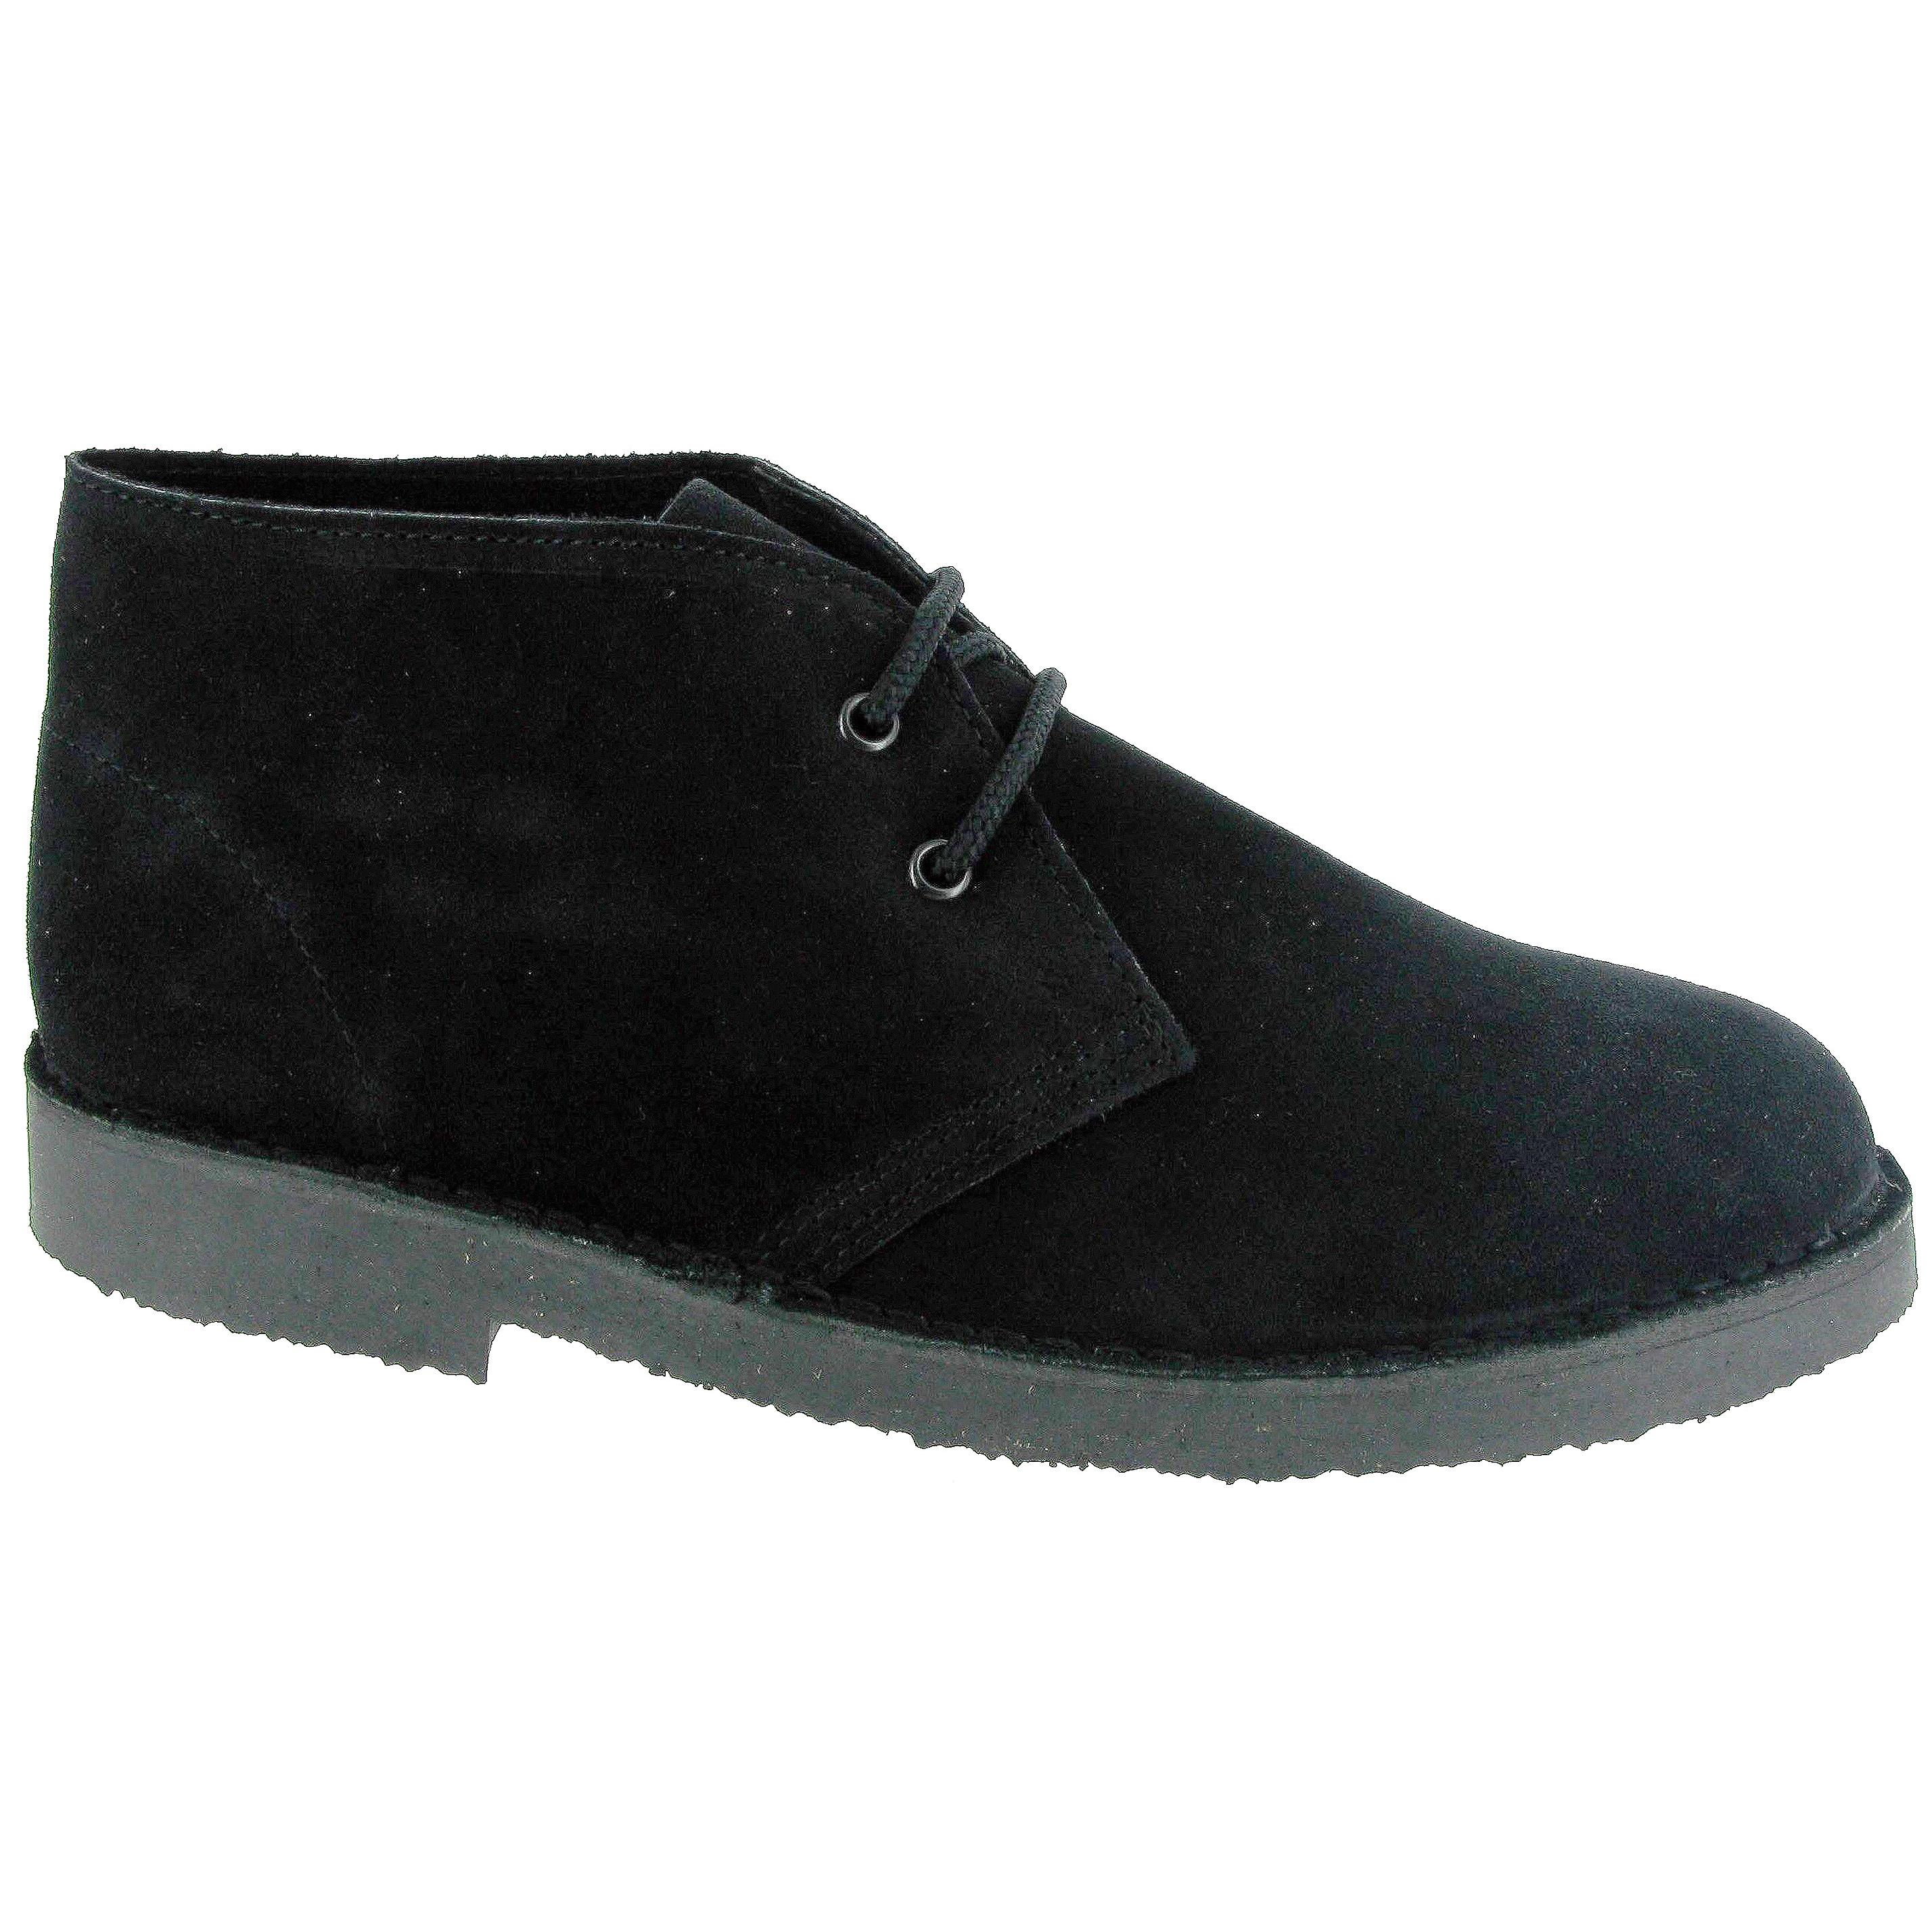 Cotswold Sahara Desert Boot / Mens Boots (15 UK) (Black)